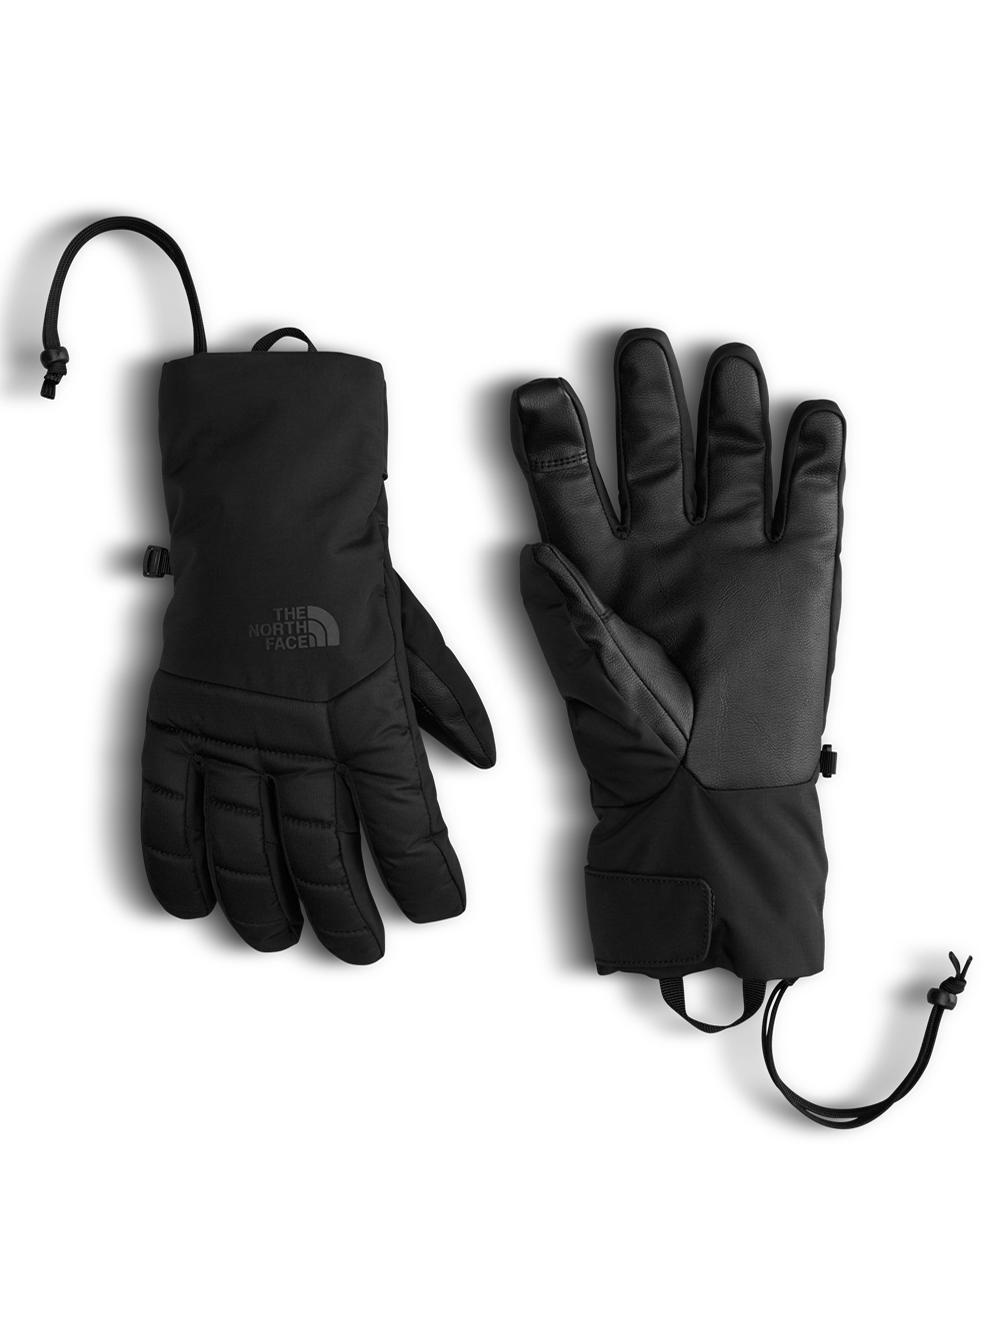 996072194 The North Face Men Guardian Etip Glove (Sizes S – XL)